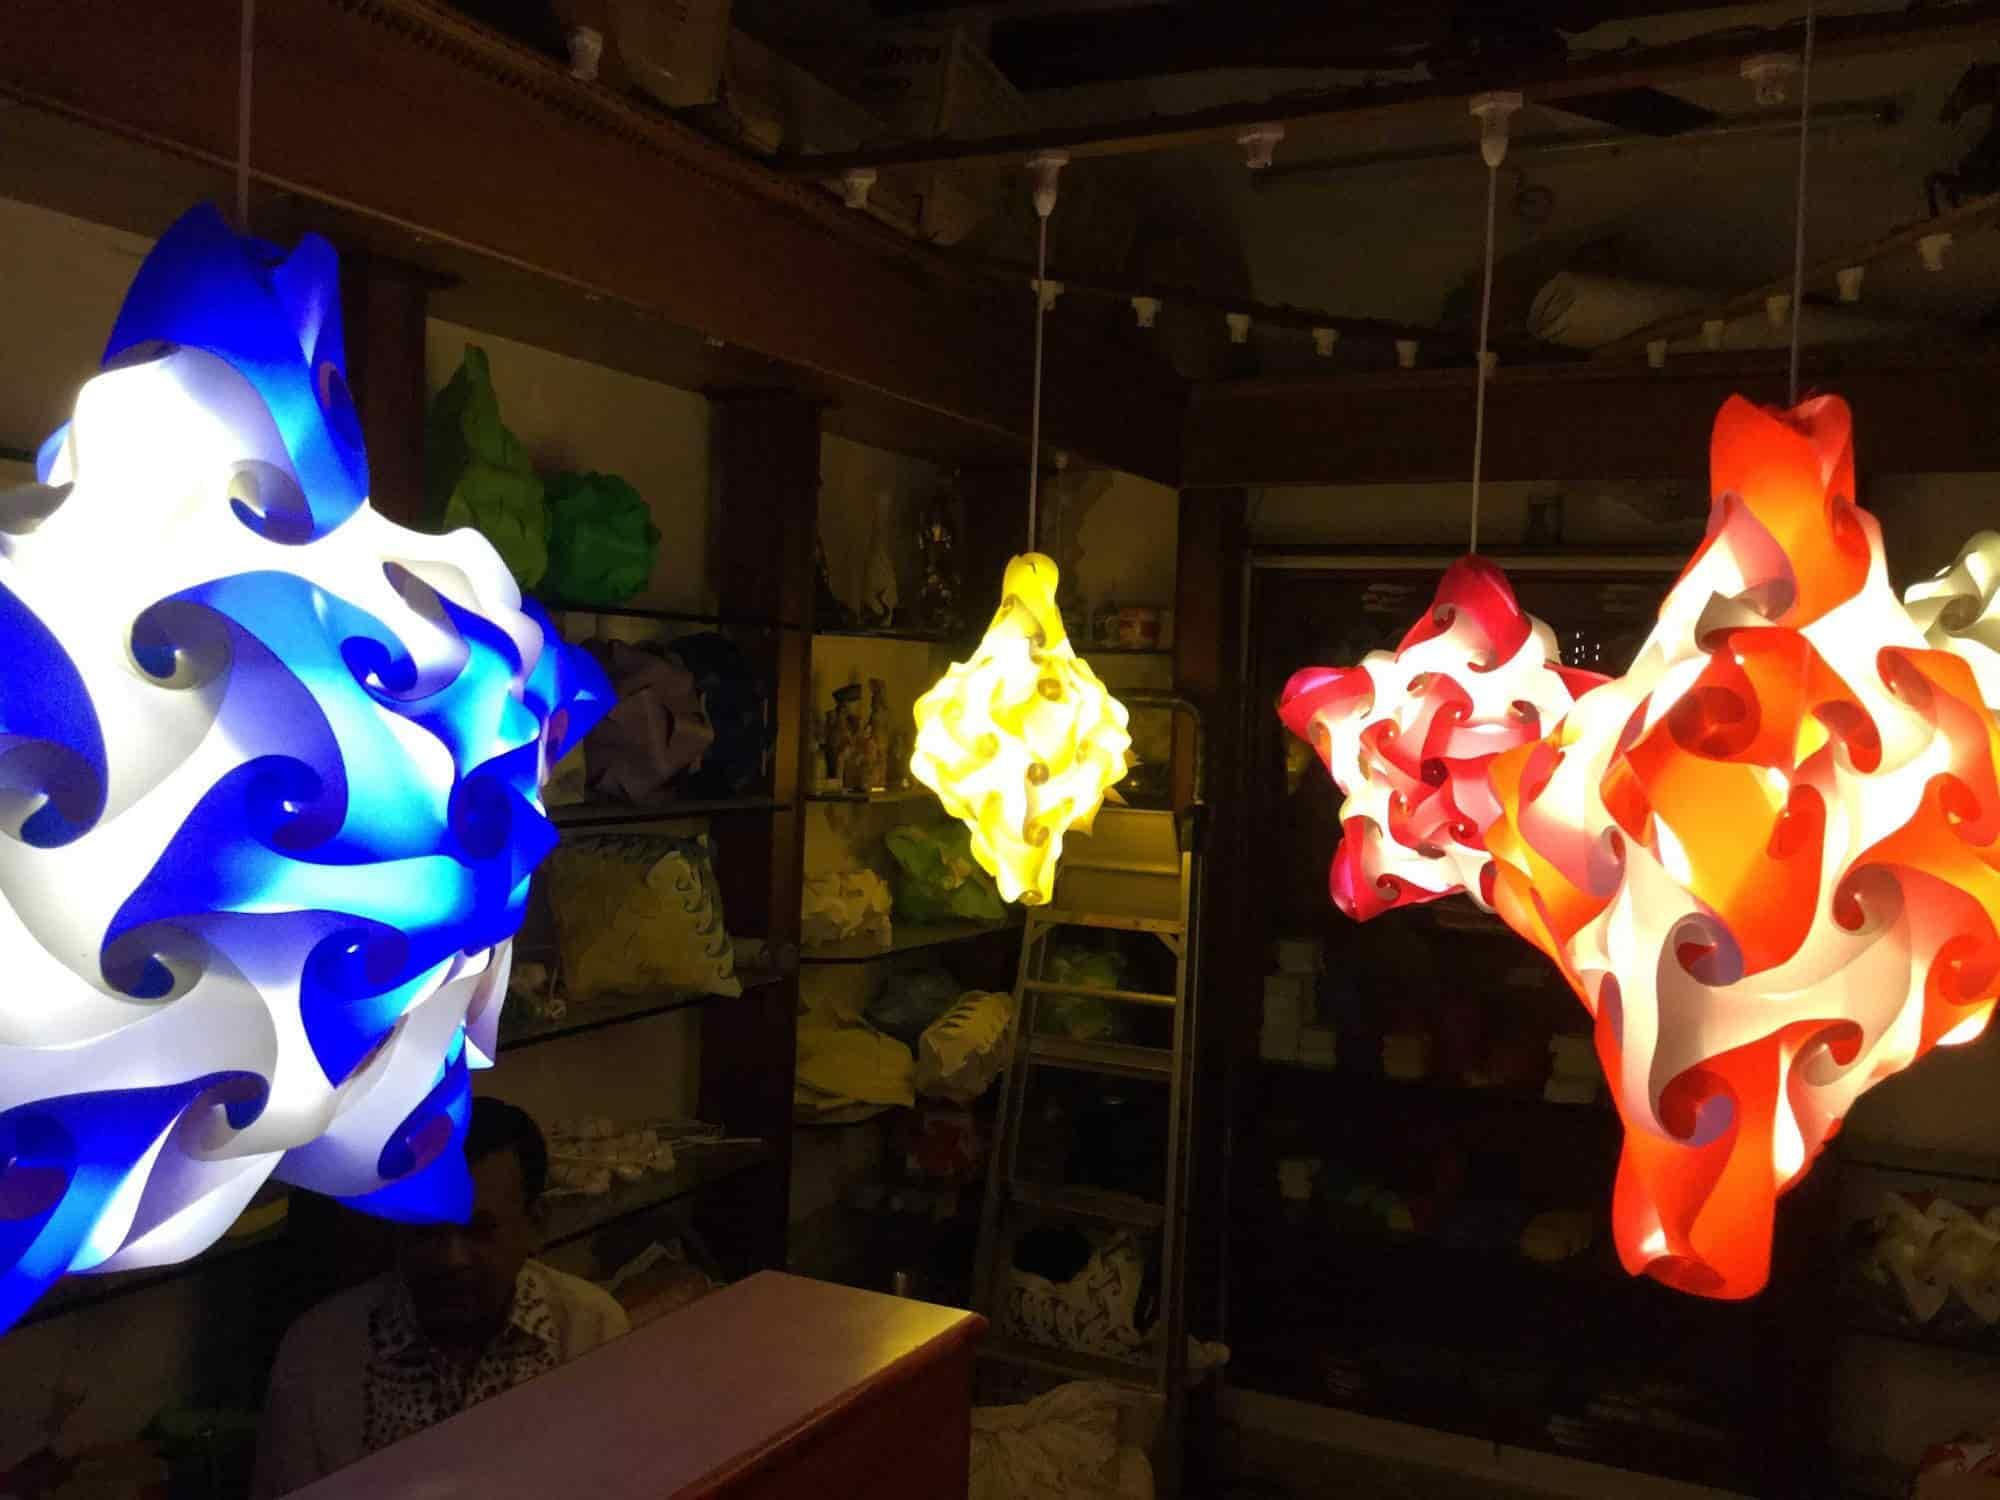 ... Decorative Light - Vijay Light Photos Kosapalayam Pondicherry - Lighting Decorators ... & Vijay Light Photos Kosapalayam Pondicherry- Pictures u0026 Images ...